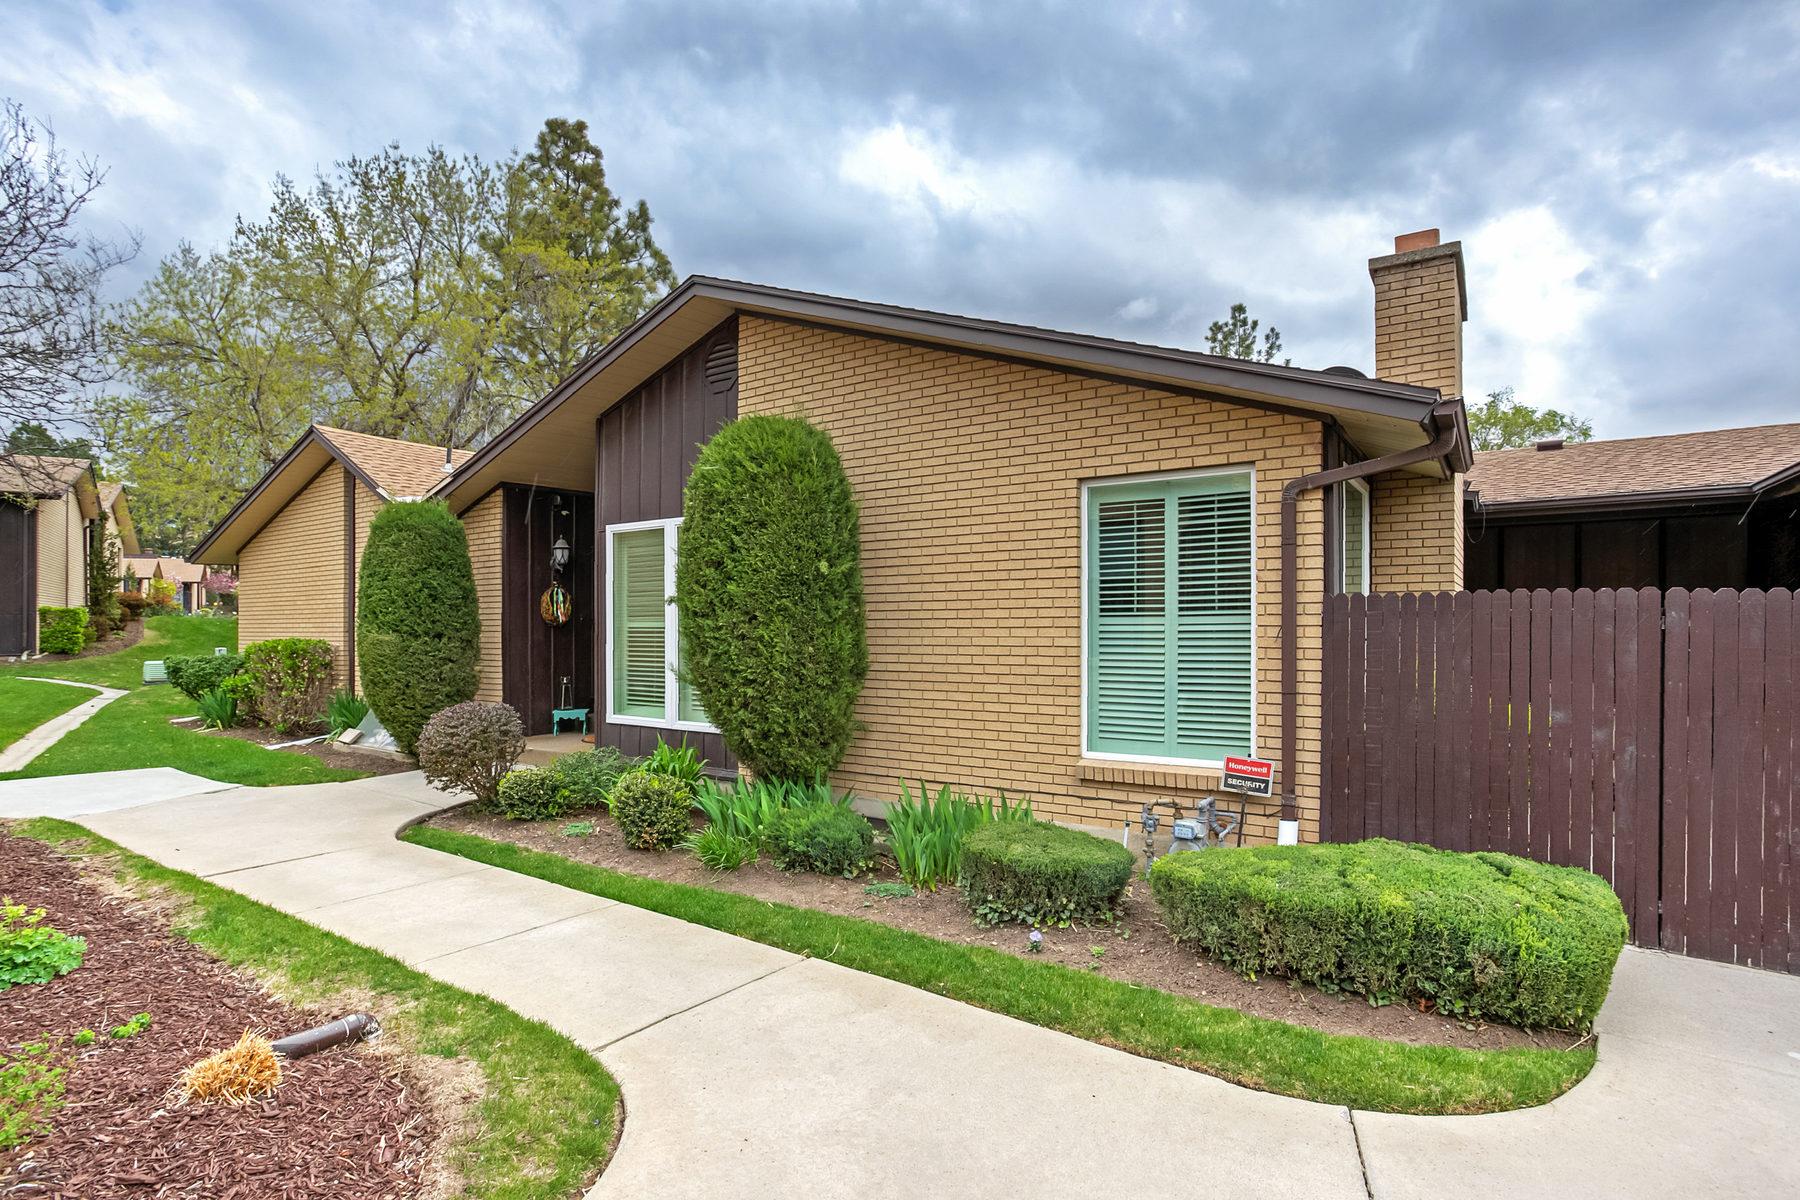 共管式独立产权公寓 为 销售 在 Fantastic Remodeled Condo 3993 South 2250 East 盐湖城市, 犹他州, 84124 美国